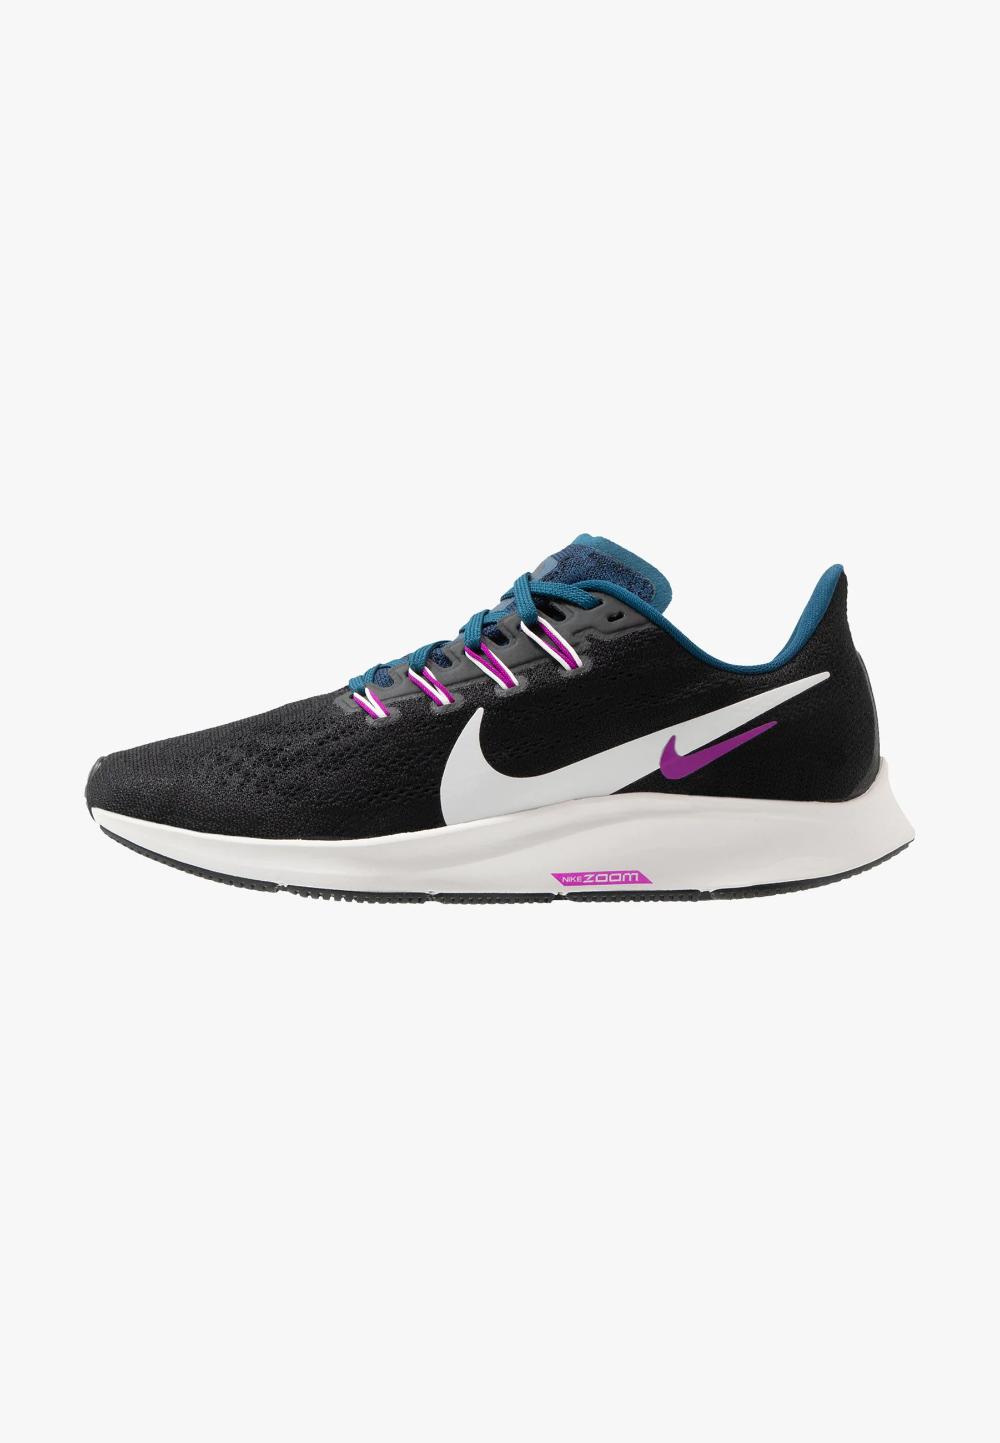 Nike Performance Air Zoom Pegasus 36 Obuwie Do Biegania Stabilnosc Black Summit White Valerian Blue Vivid Purple Czarny Zalando Pl Fitness Fashion Sneakers Nike Sneakers